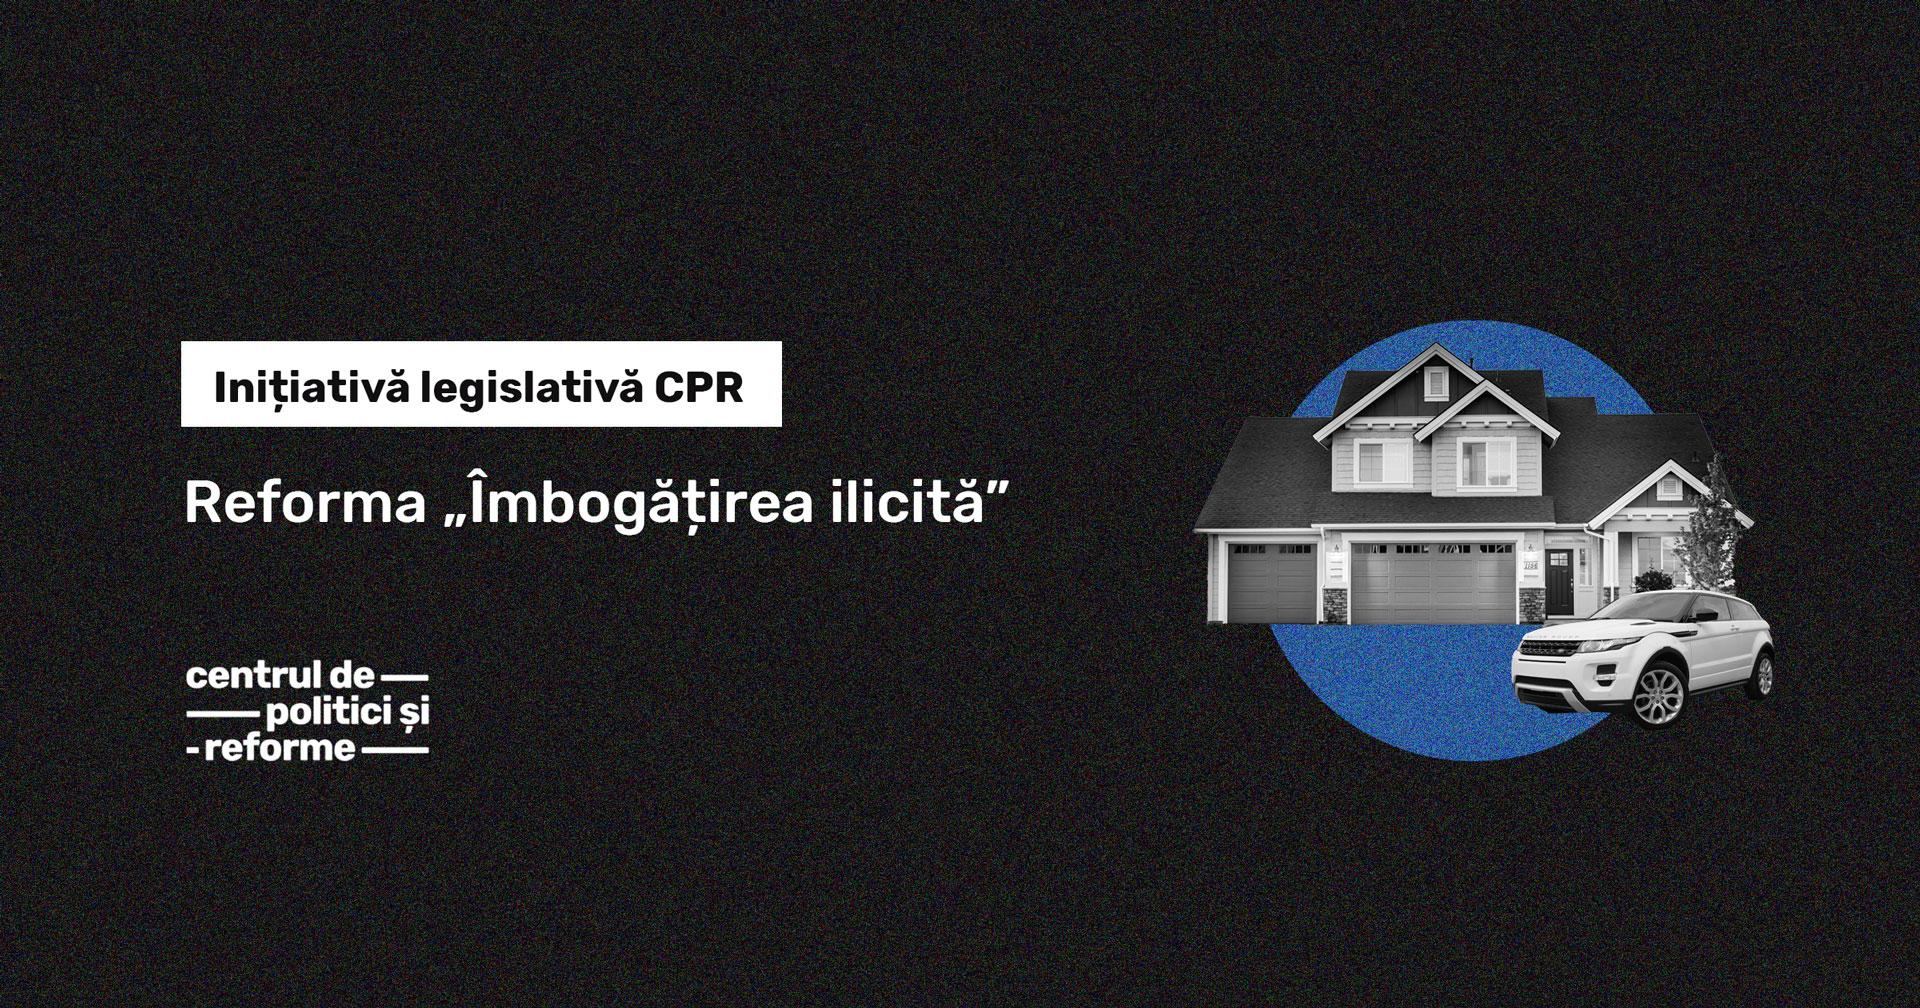 imbogatirea-ilicita-reforma-CPR-Moldova-Centrul-de-Politici-si-Reforme